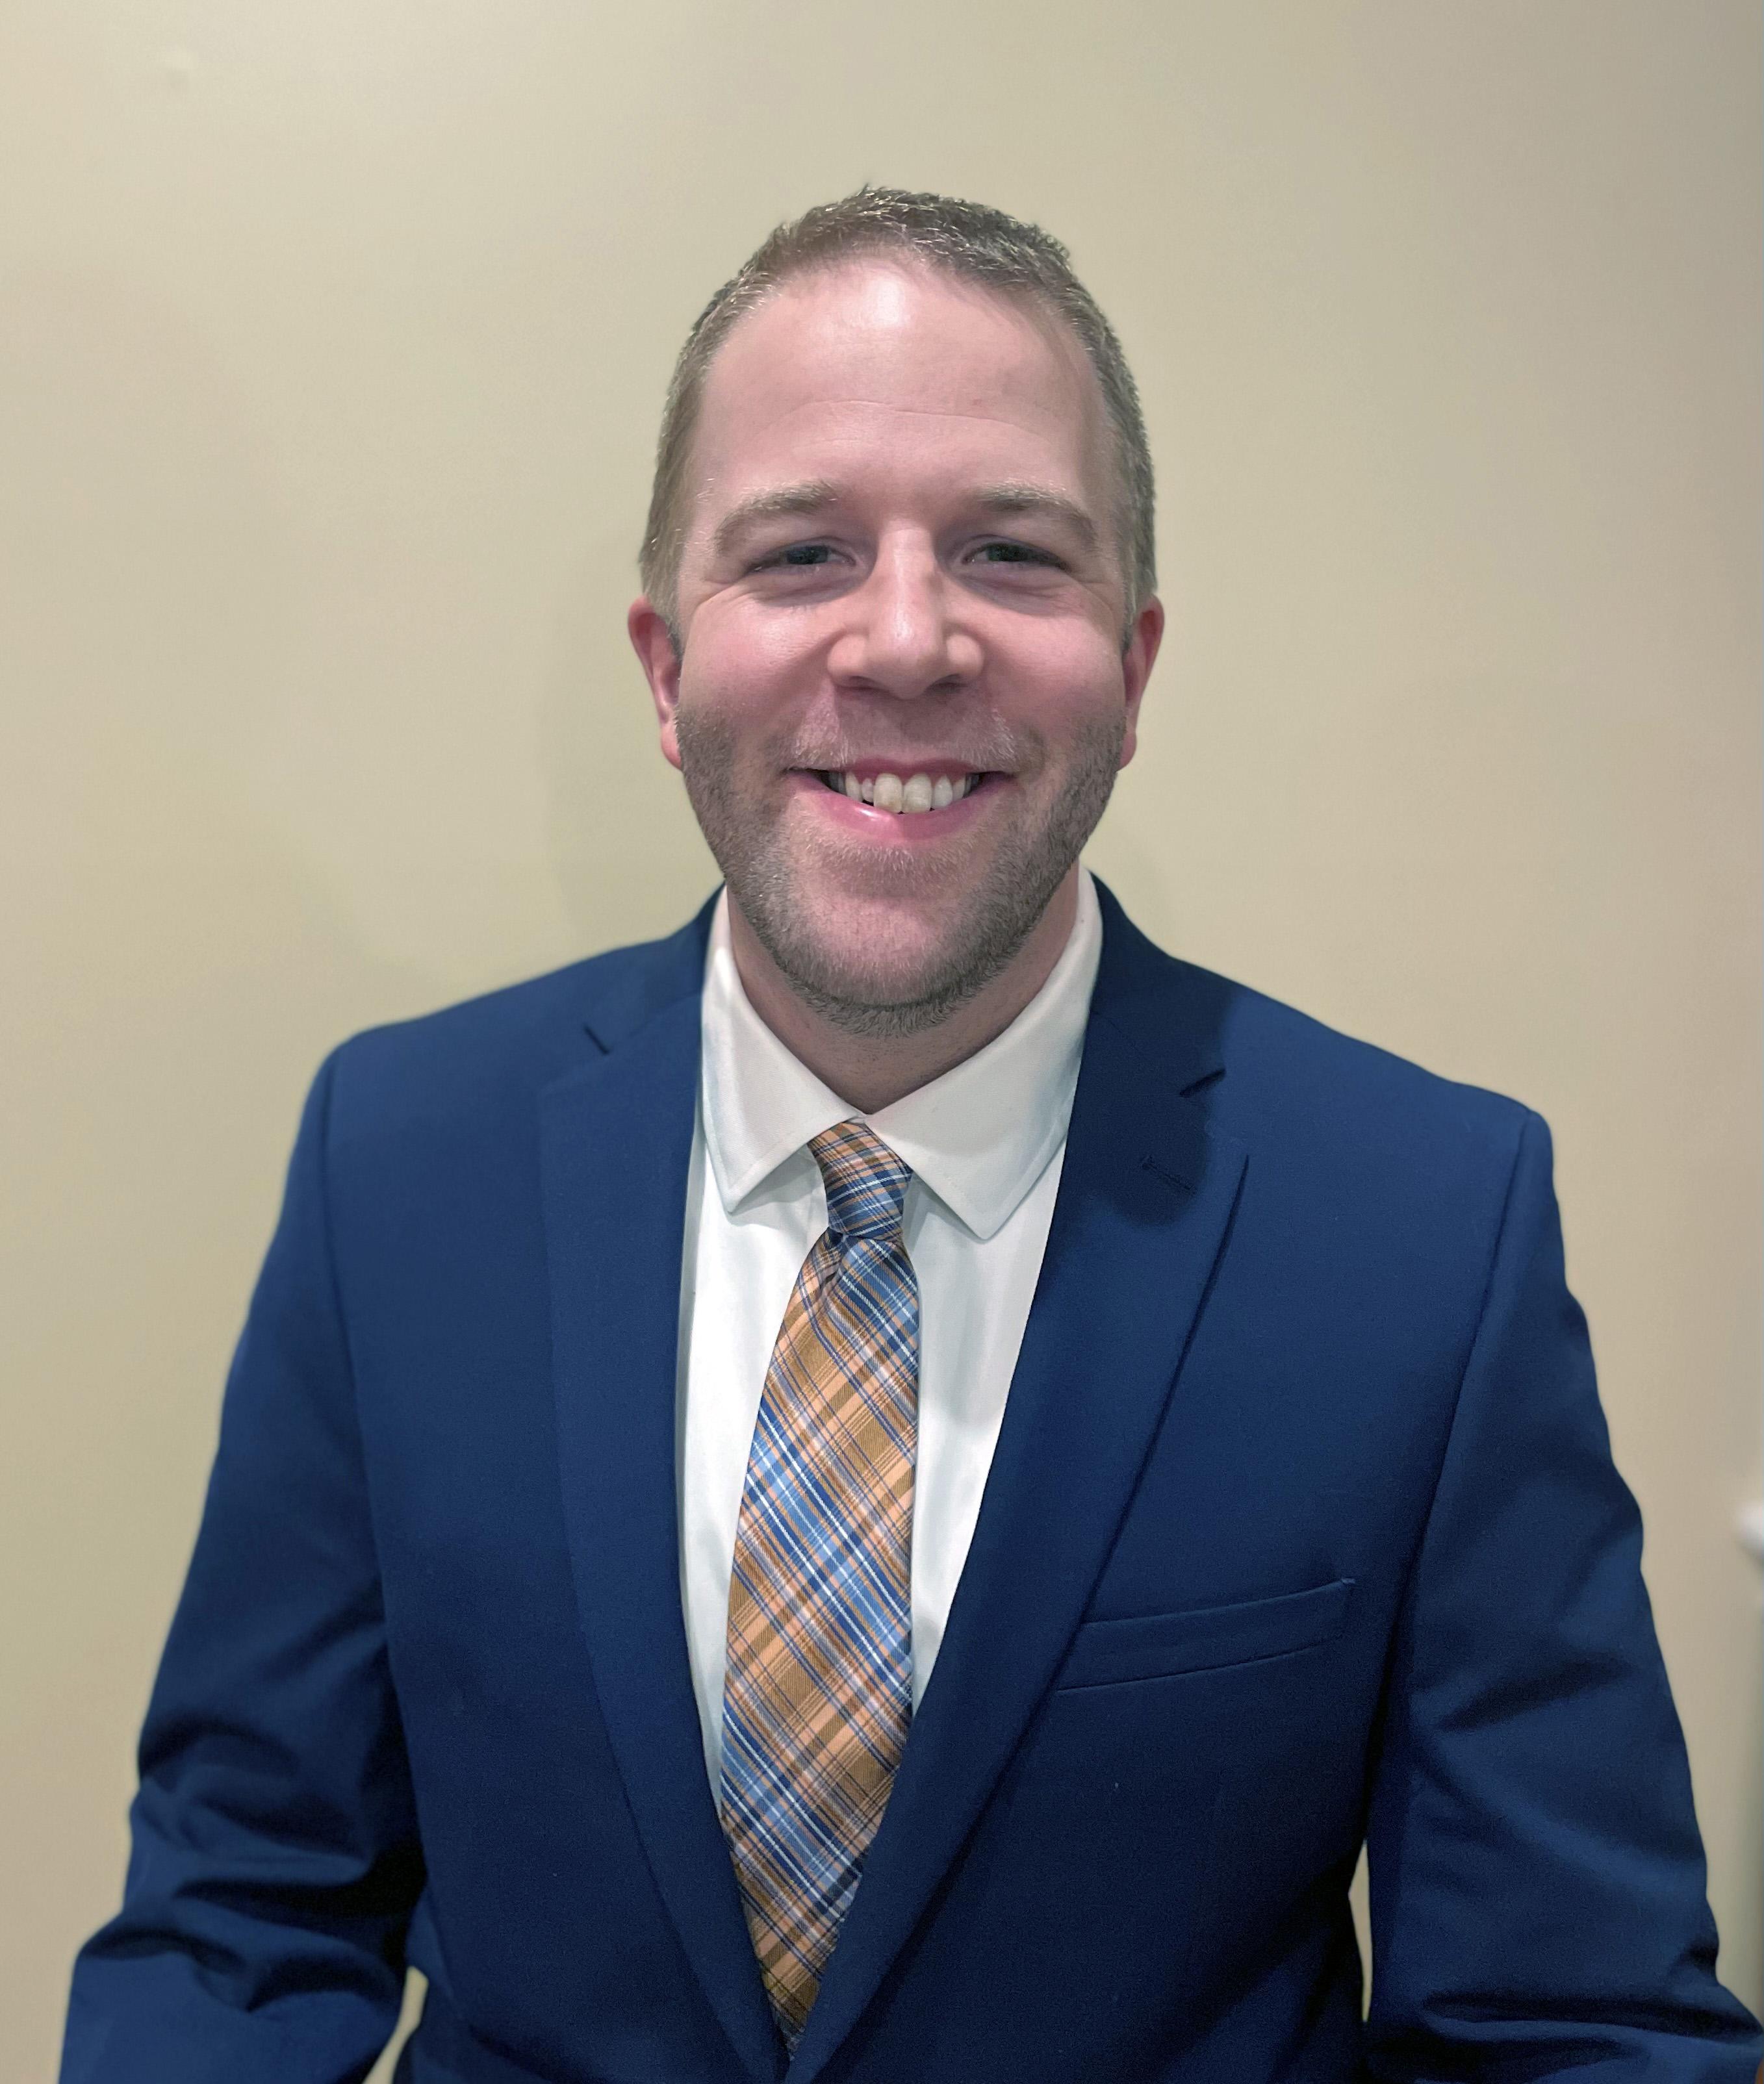 Bryan Bjorklund named Comet head football coach